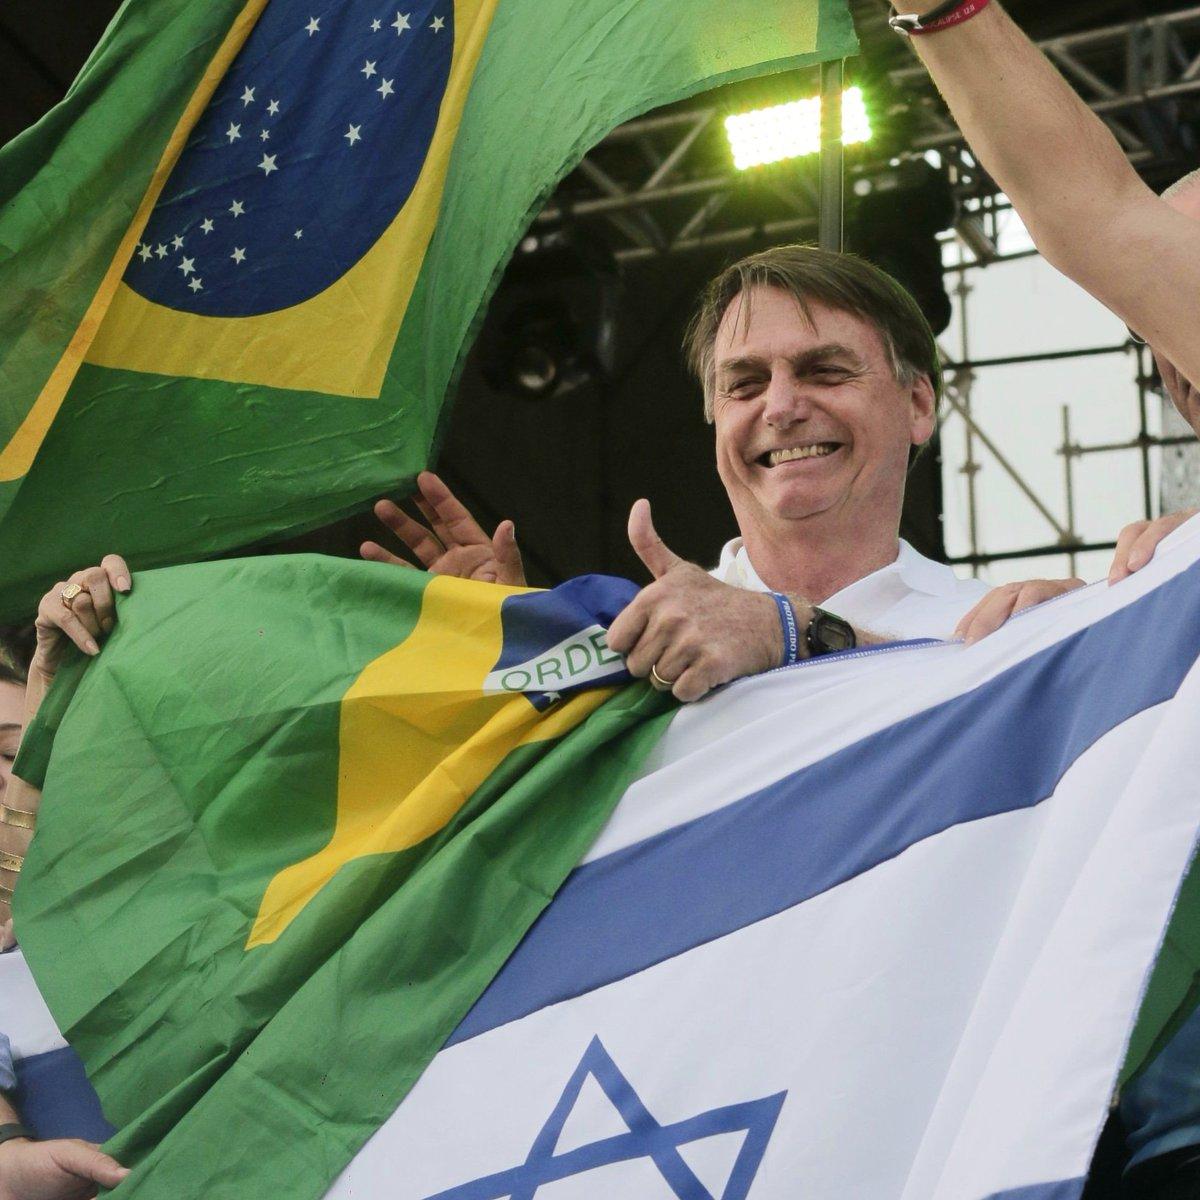 Presidente Brasil afirma que si el congreso rechaza reforma buscará reelección